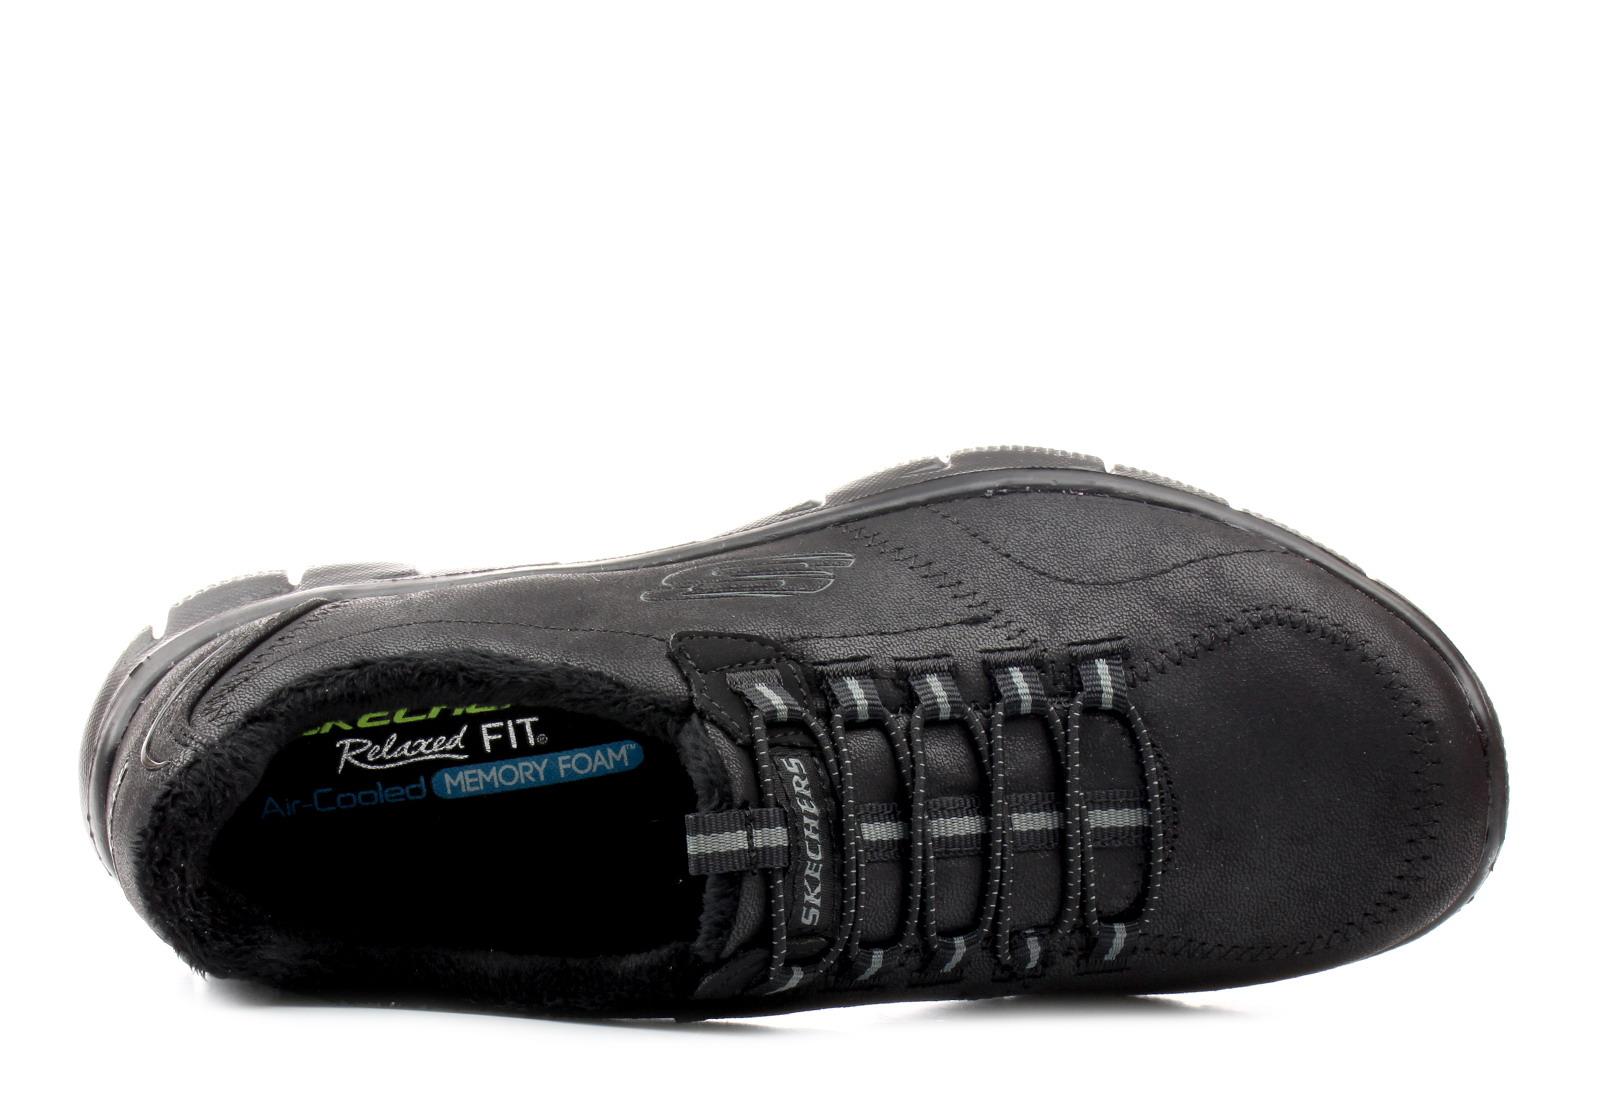 binario proyector hotel  Skechers Pantofi - Empire - Latest News - 12394-bbk - Office Shoes Romania